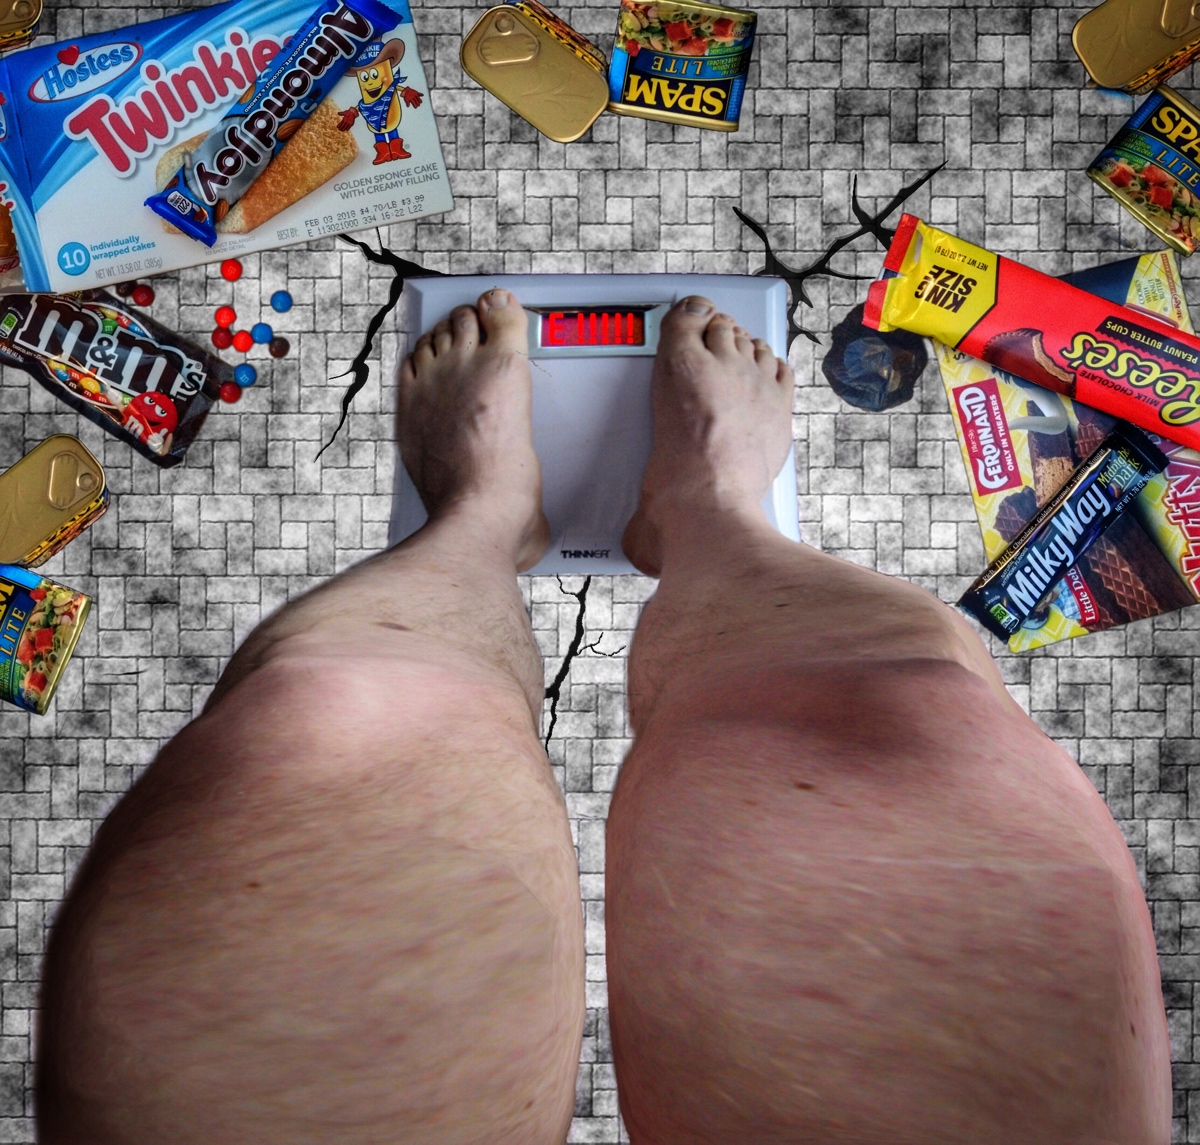 The Spam Lite & Snacks Diet